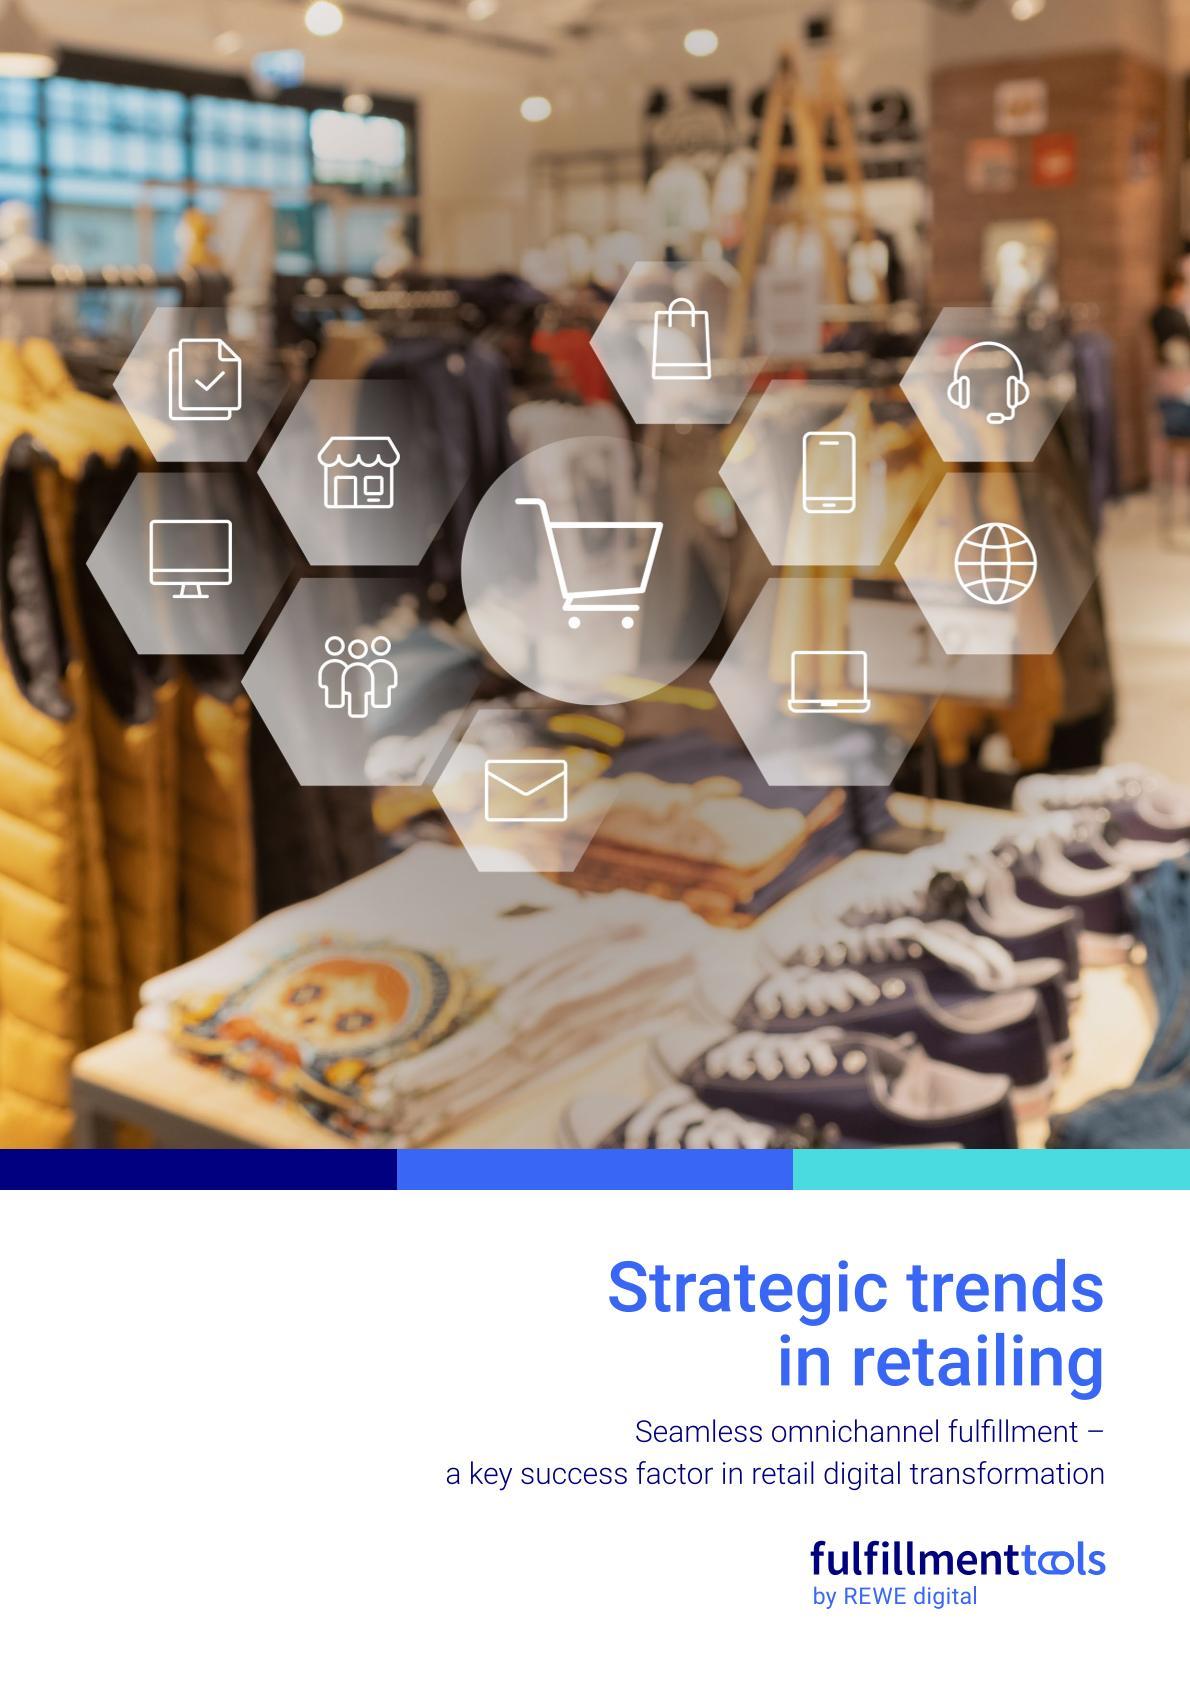 strategy-whitepaper-fulfillmenttools